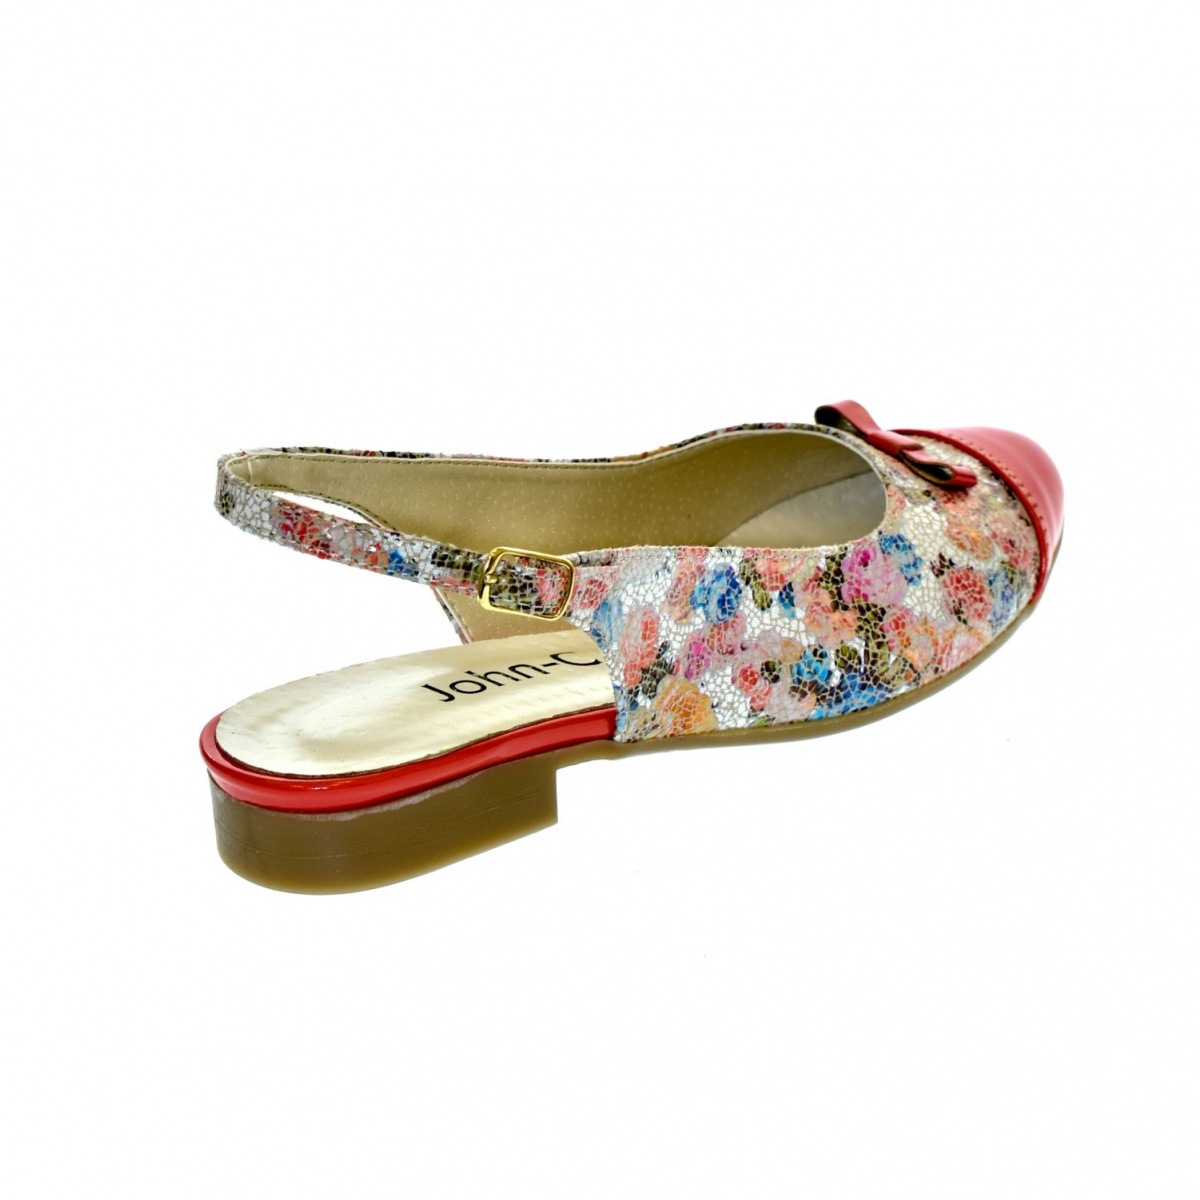 89b6e38a63c0 Dámske korálové sandále EVELINE - 3